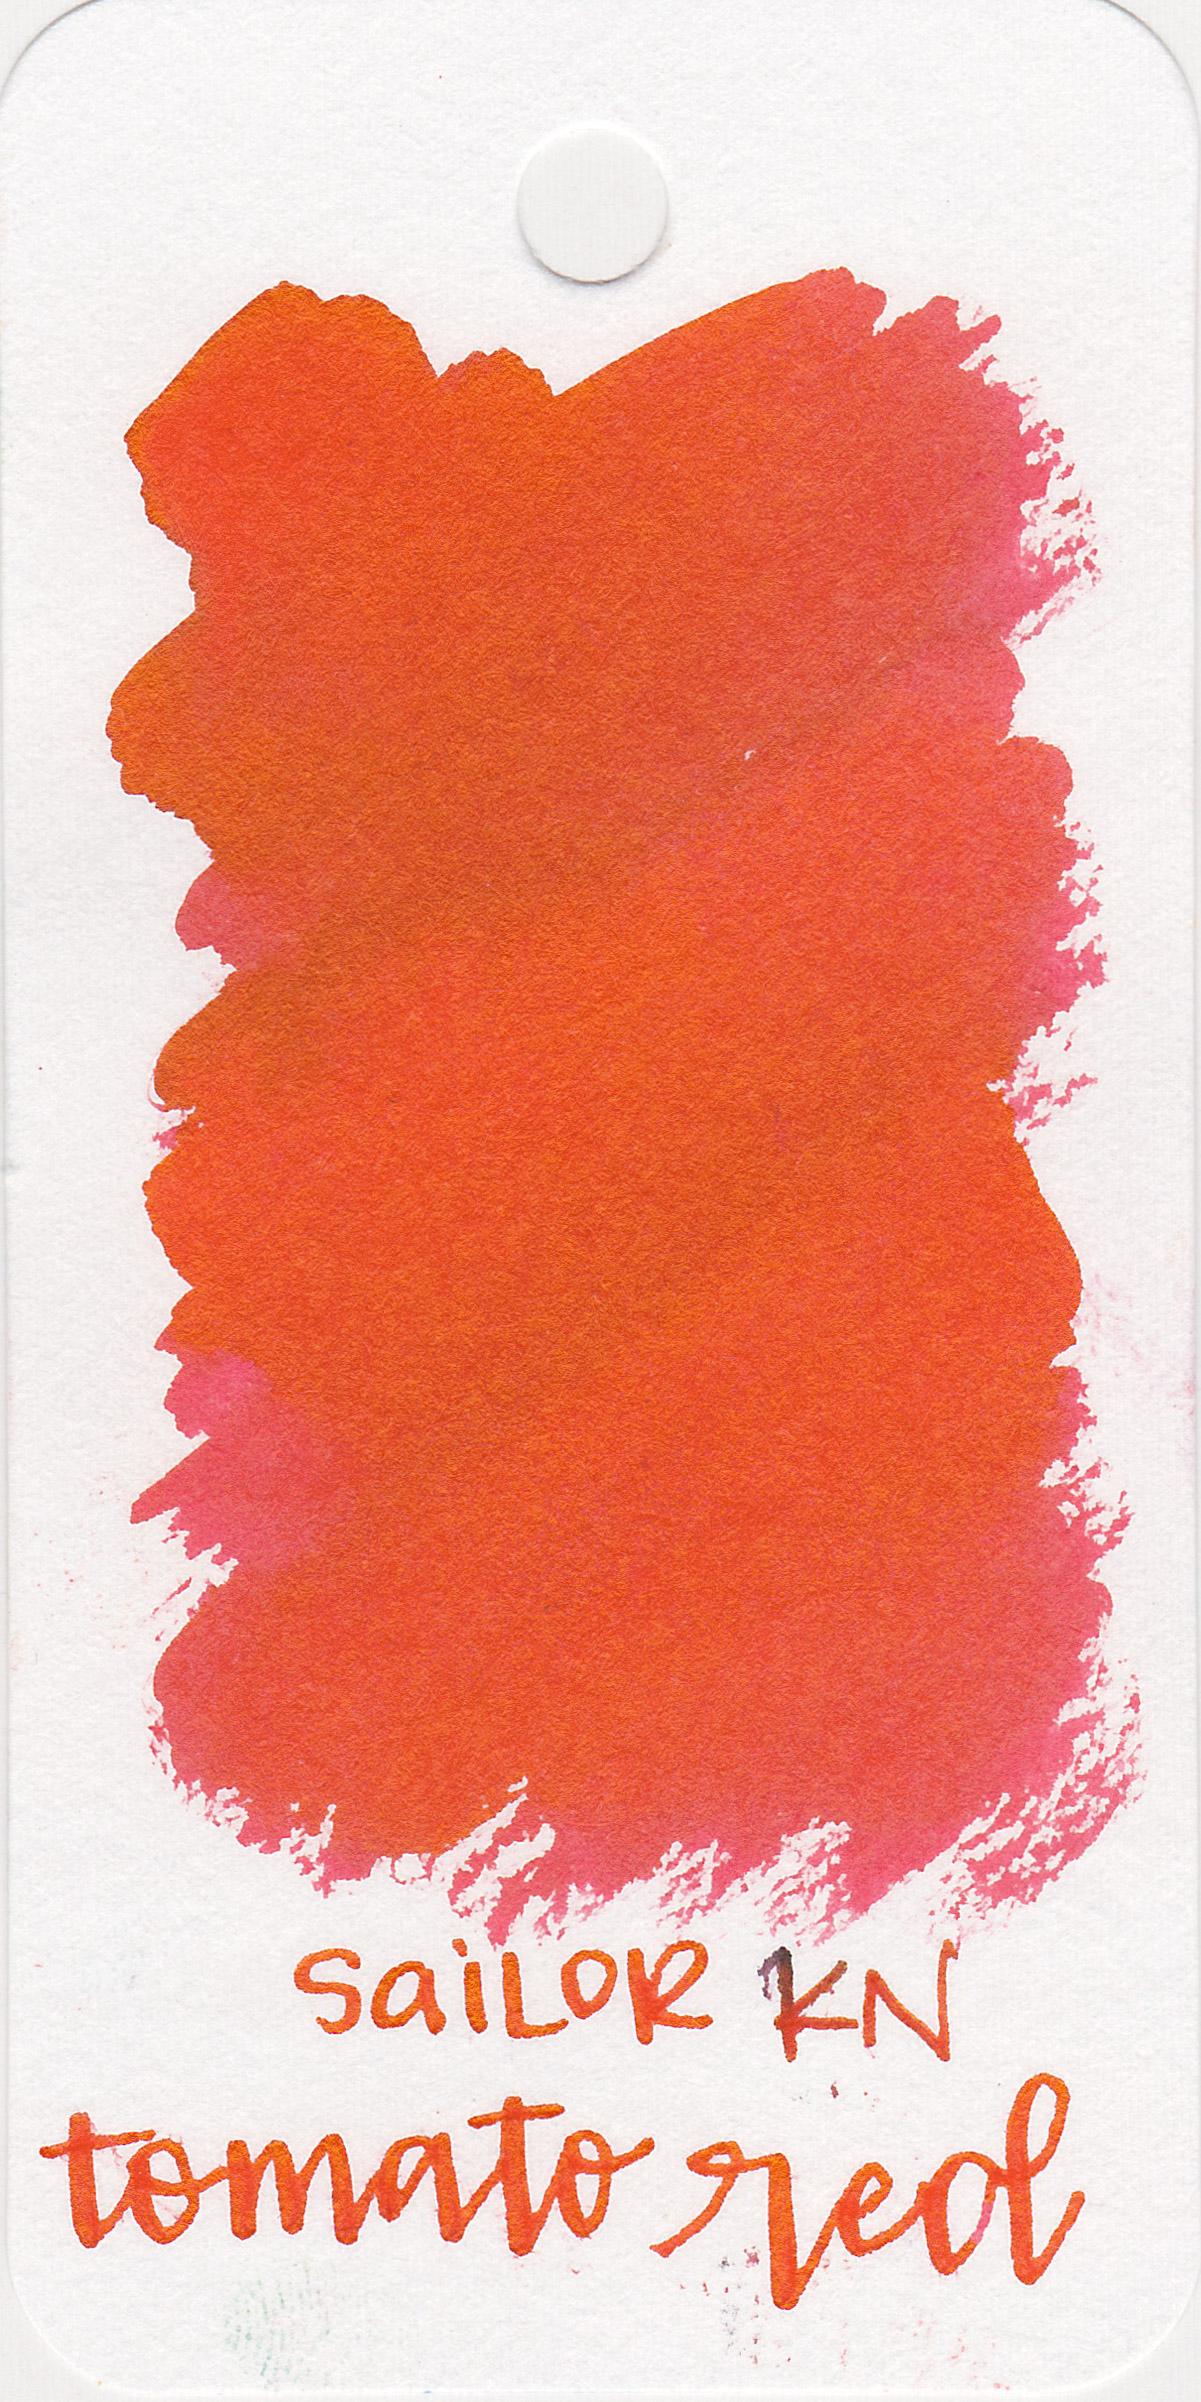 kn-tomato-red-1.jpg